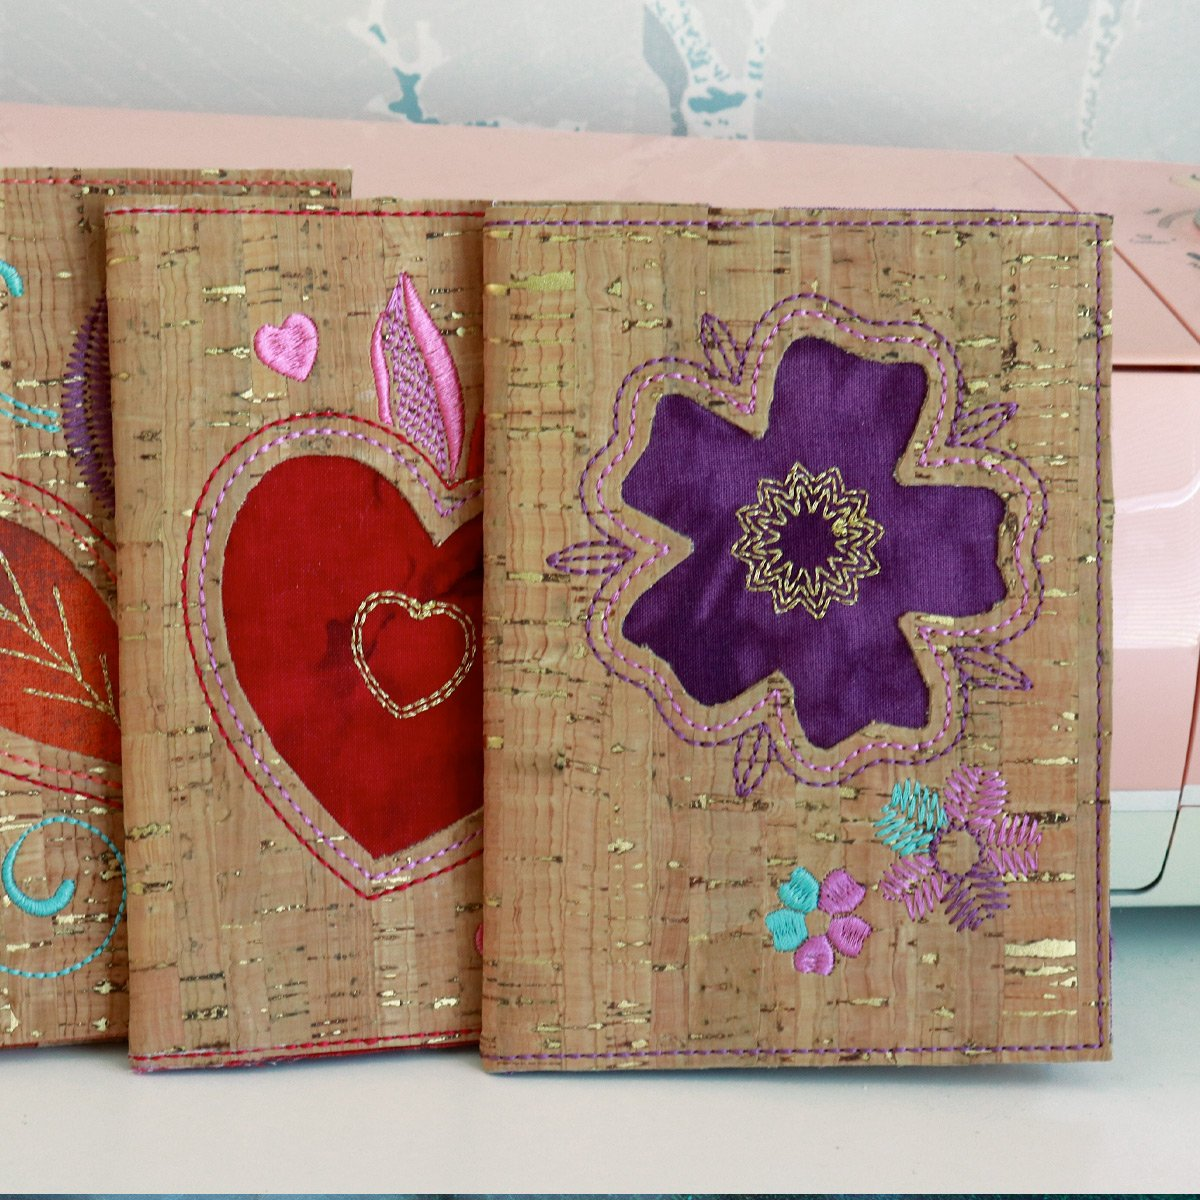 Reverse Applique Notebook Covers